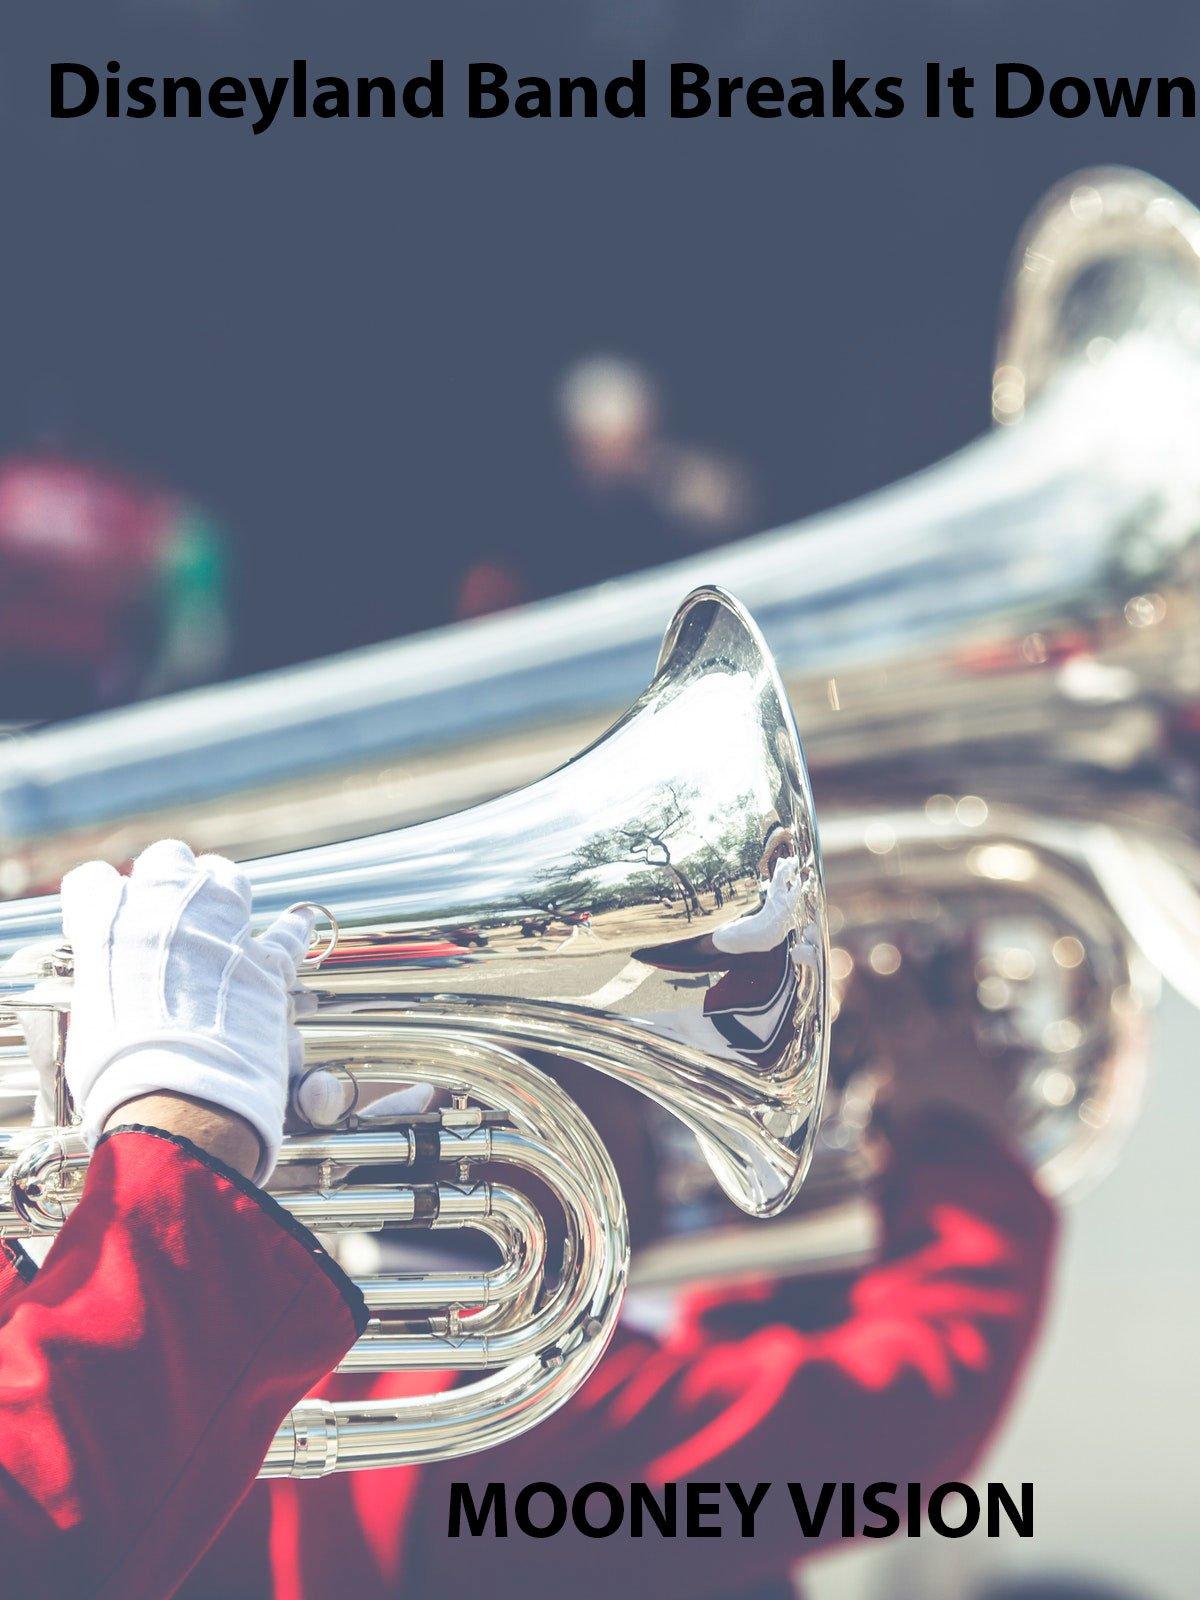 Disneyland Band Breaks It Down